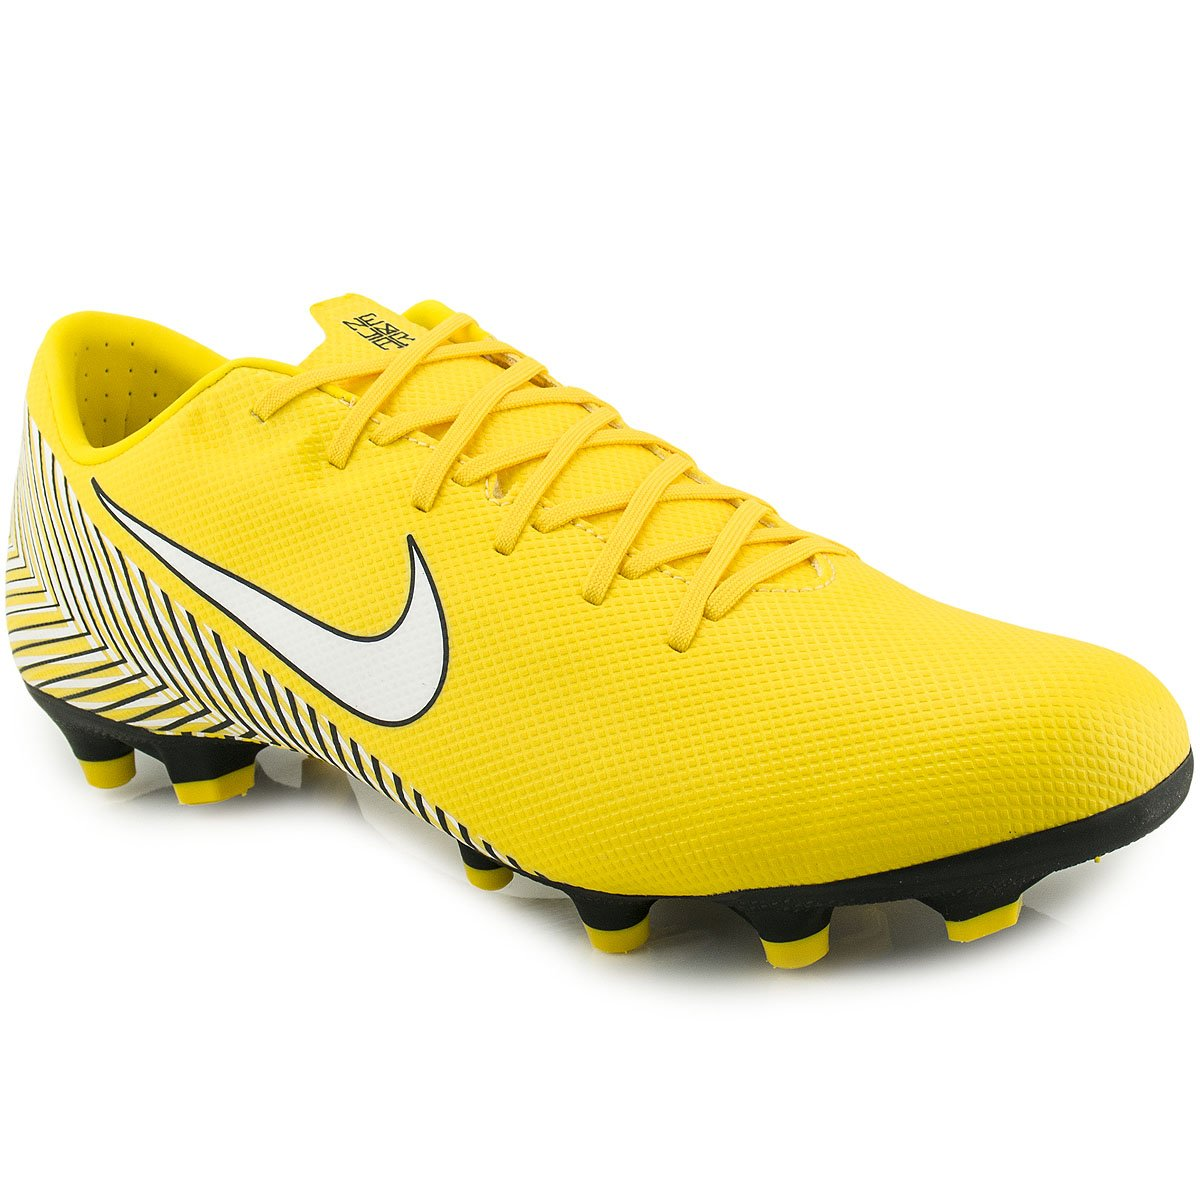 buy popular 1cded eaeee Chuteira Nike Mercurial Vapor XII Academy Neymar Jr. MG   Futebol